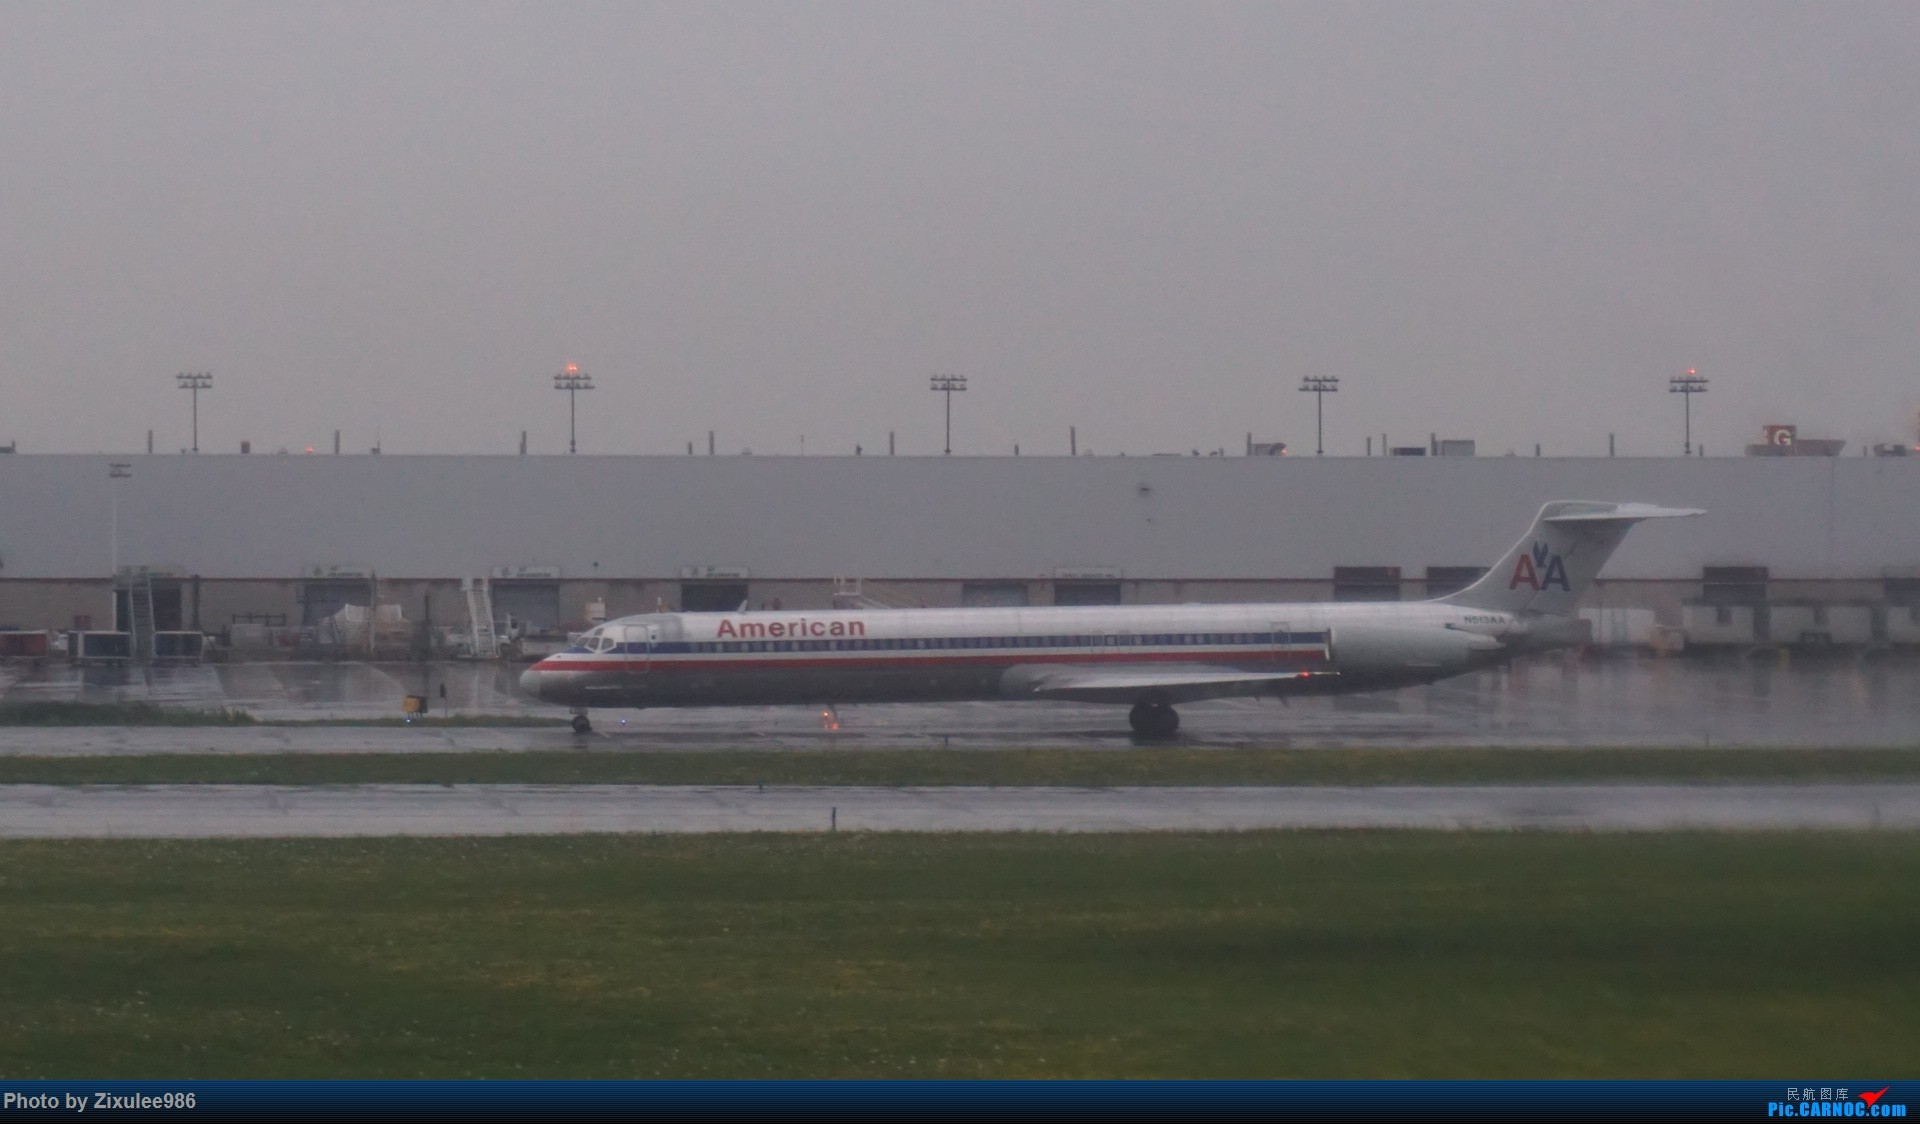 Re:[原创]加拿大21日游学之旅 (二)~加航AC28..PVG-YYZ到达多村后的雨天~多图缓更(将会附上上一集忘发的flightlog)请各位大侠谅解~ MD MD-80-82 N513AA 加拿大多伦多皮尔逊机场